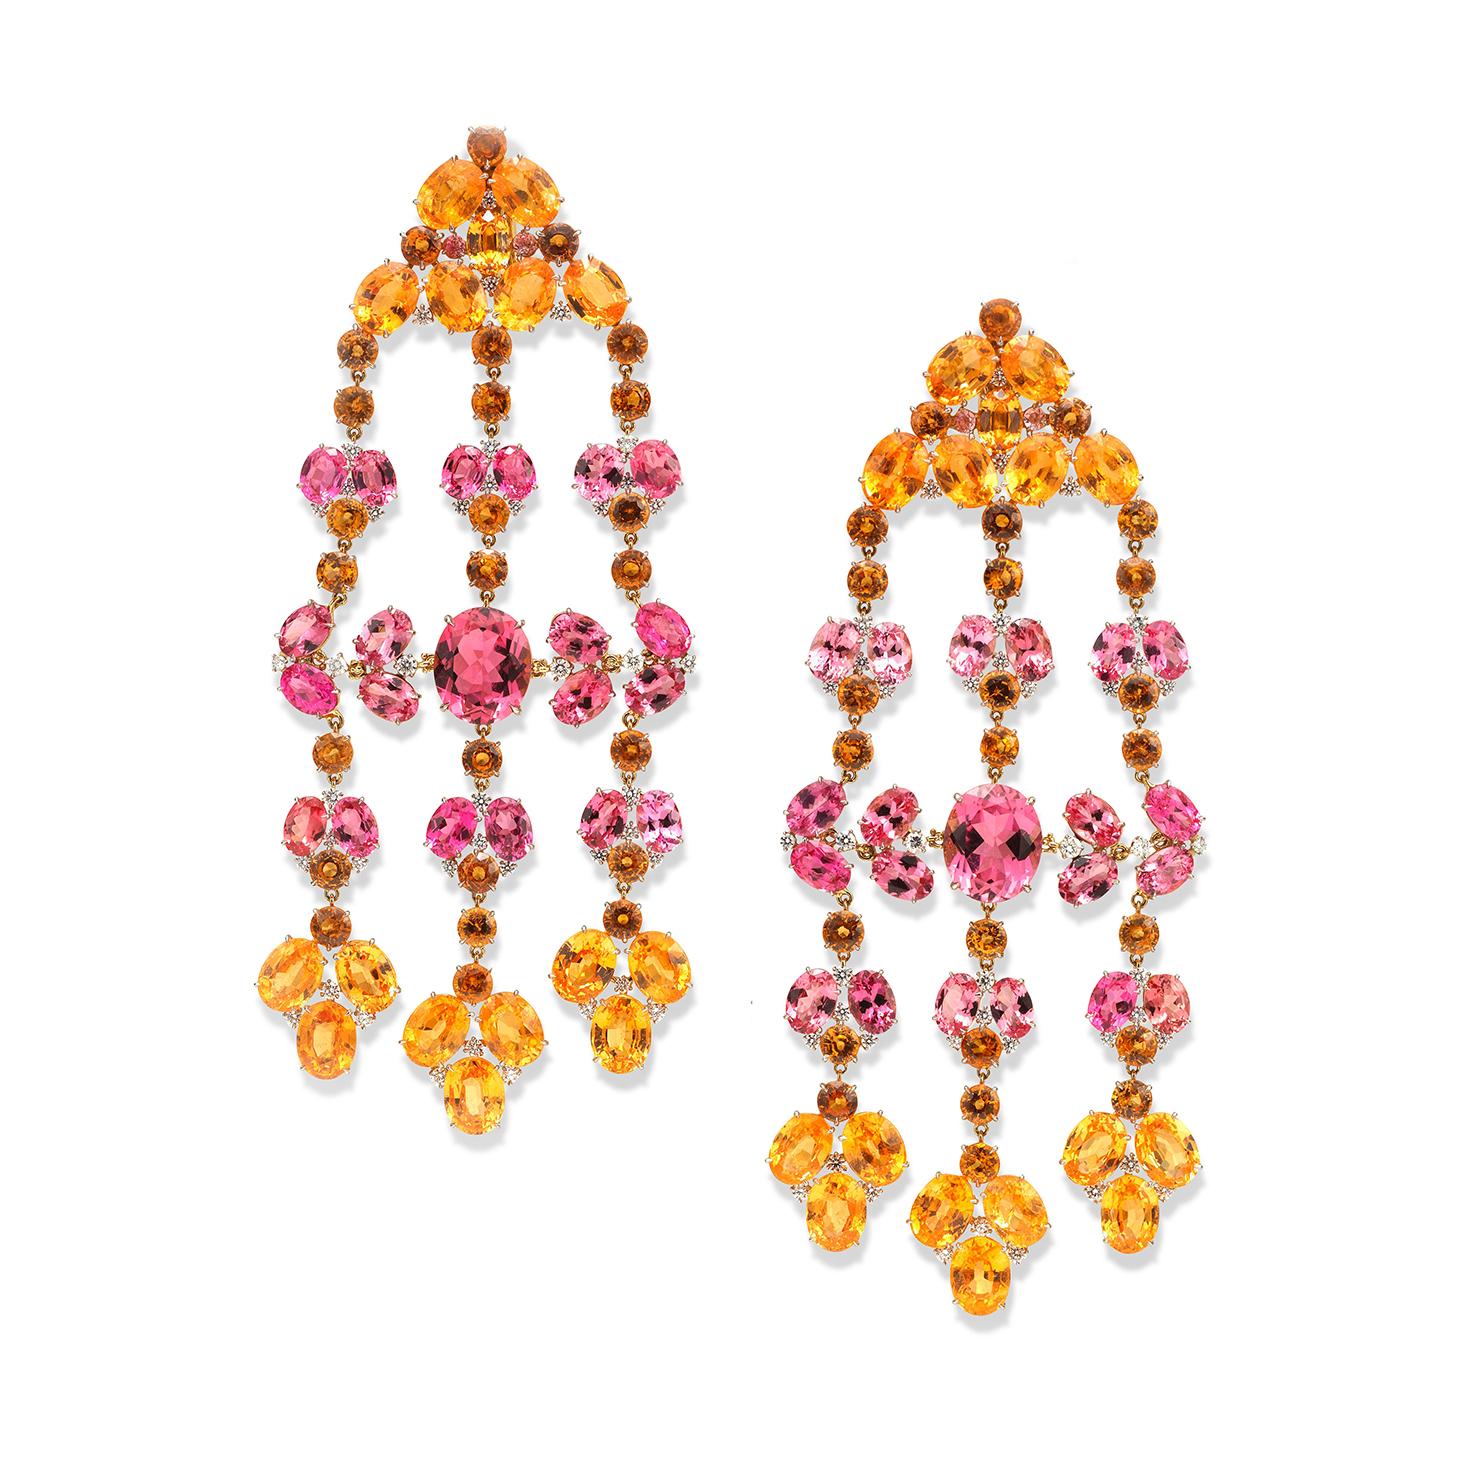 A Pair of Spinel, Garnet, Tourmaline and Diamond Ear Pendants, by SABBA